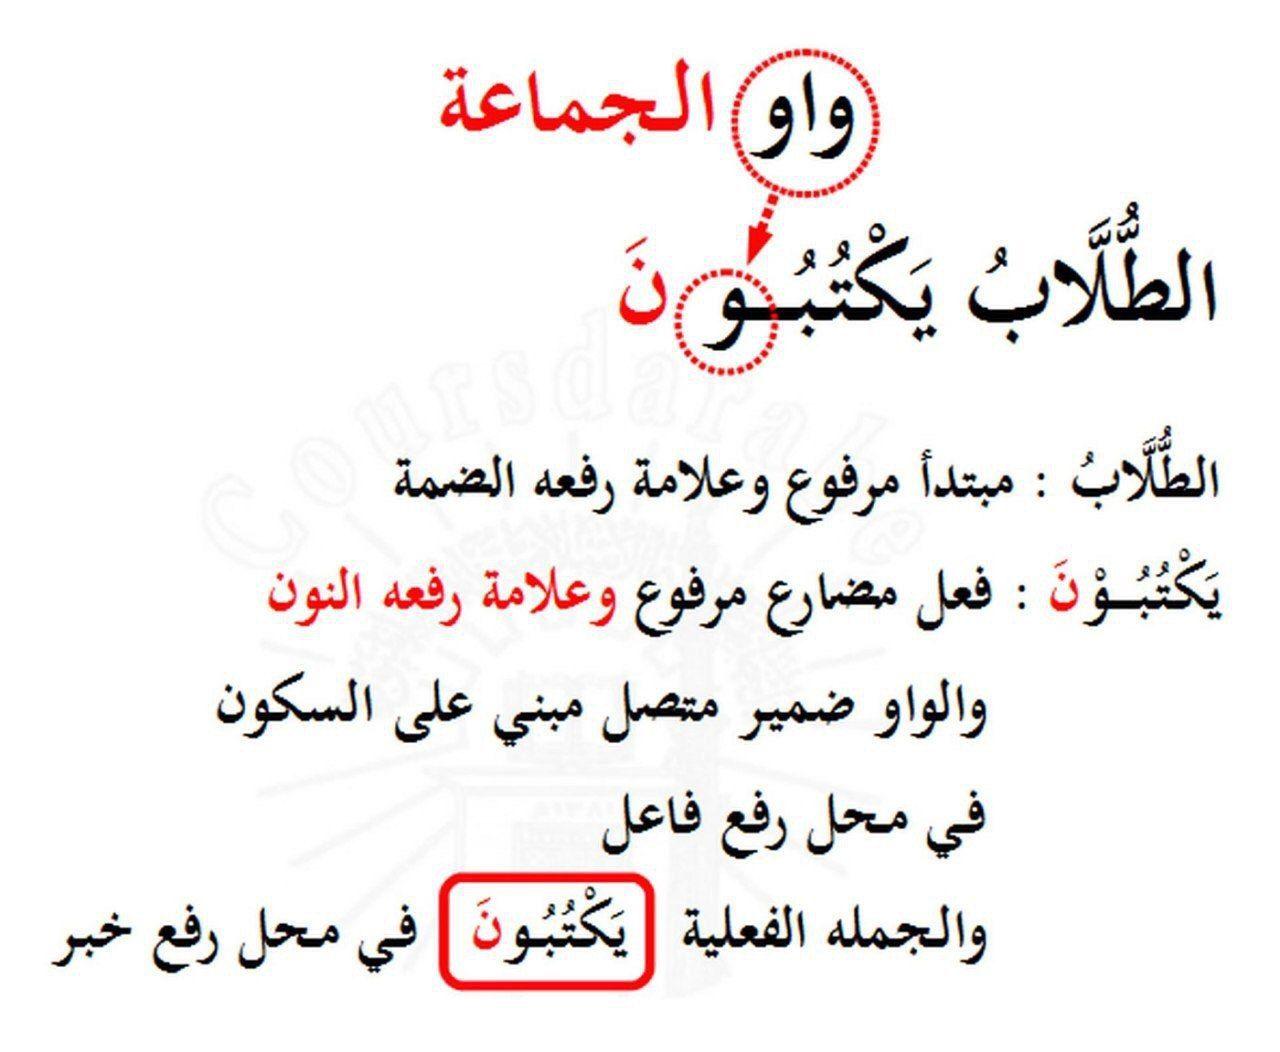 Pin By Soso On علامات الإعراب Learning Arabic Education Math